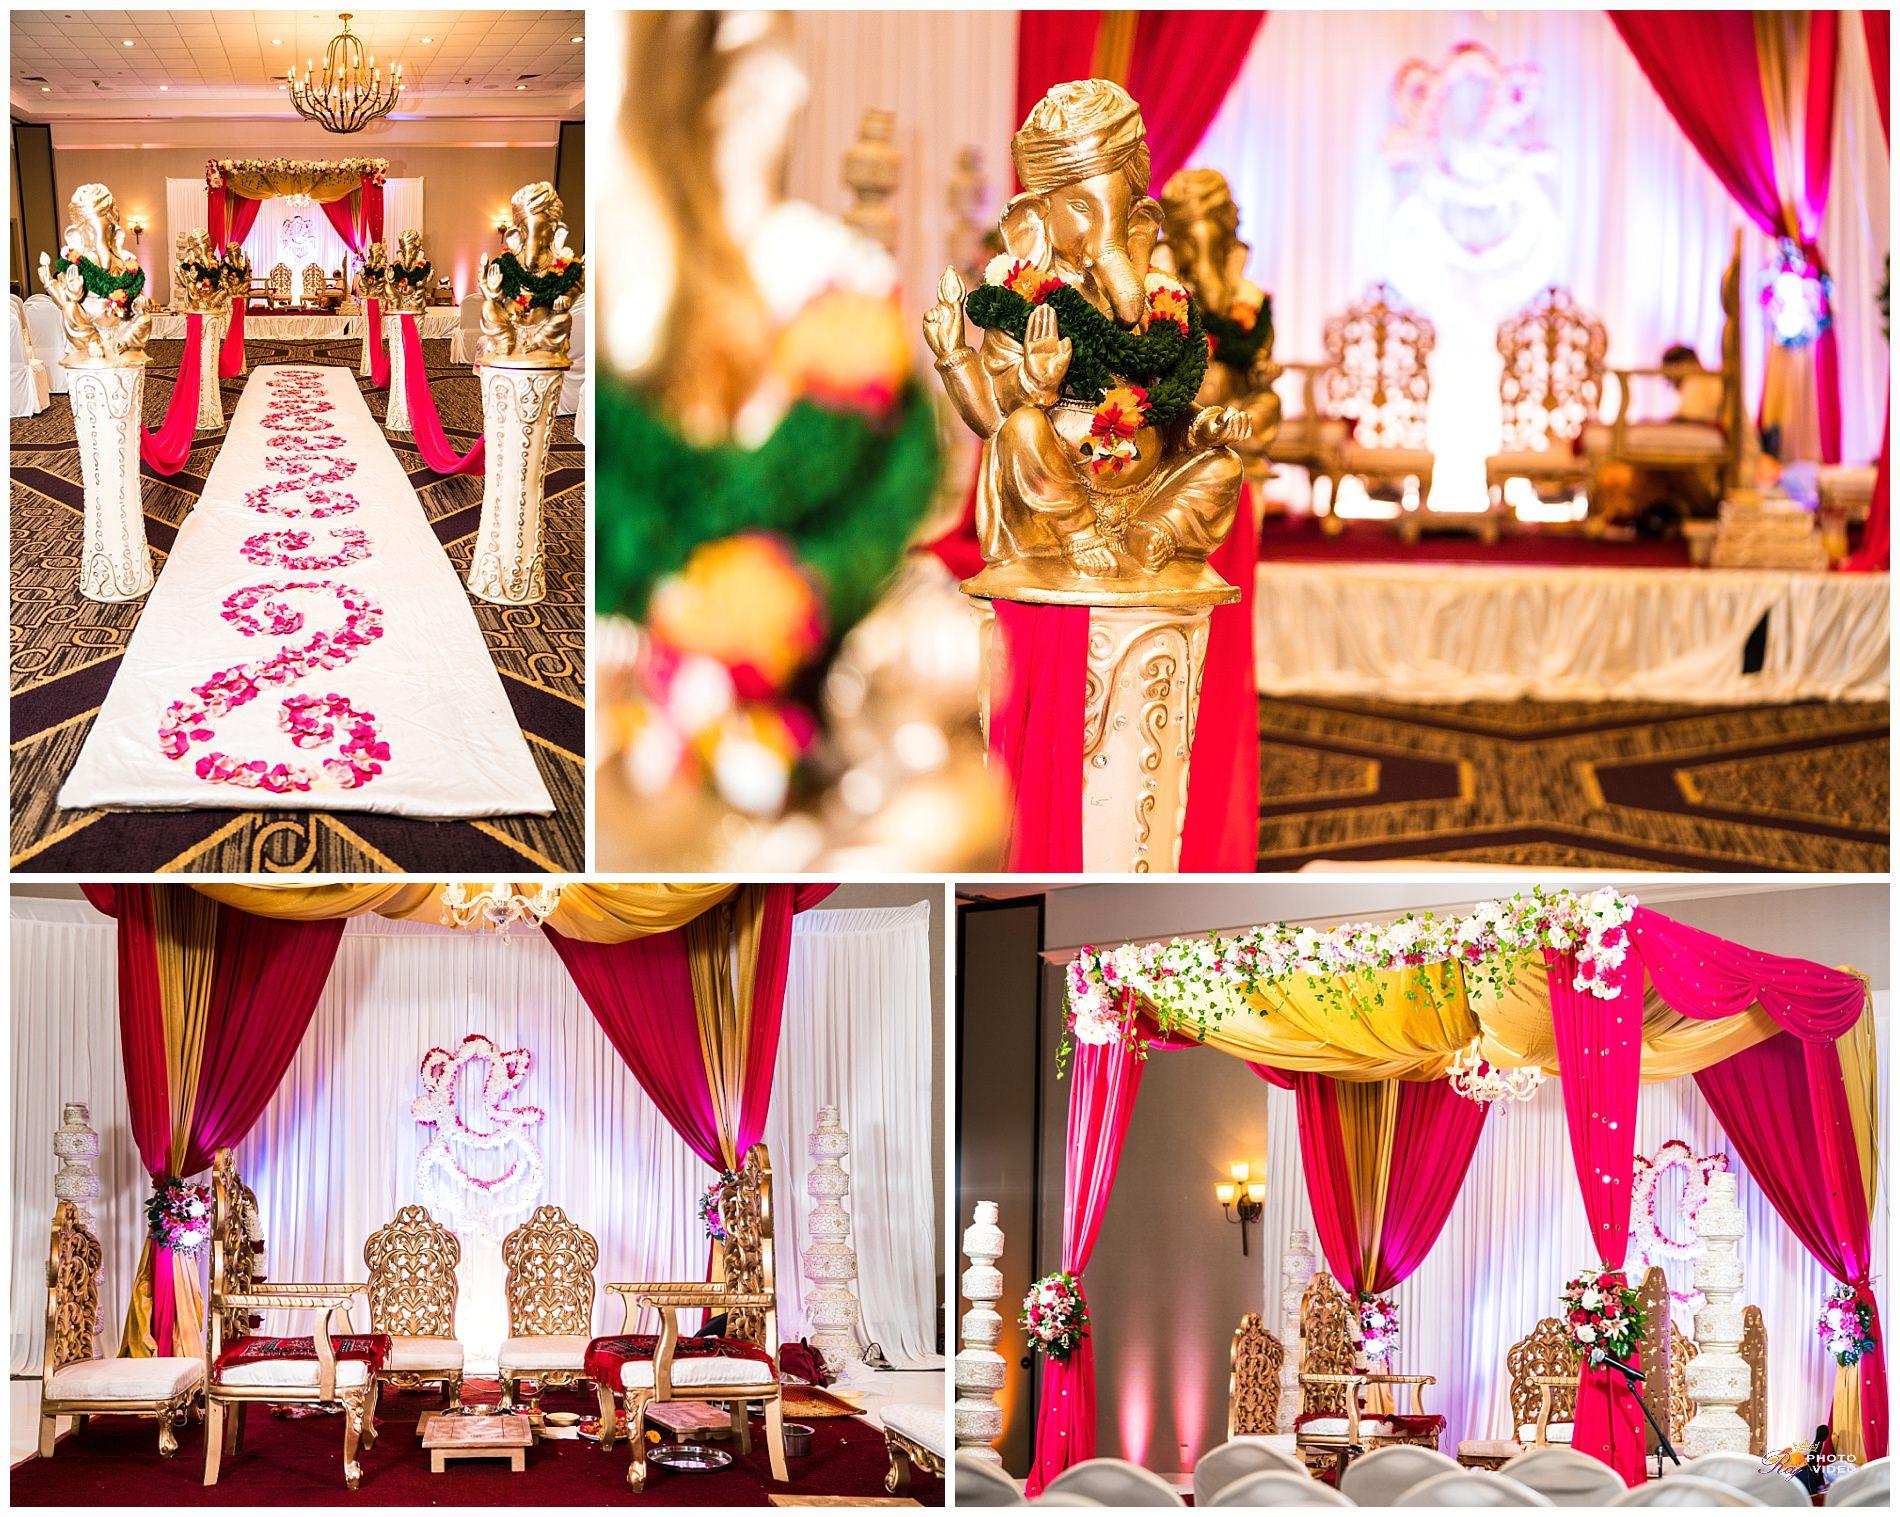 doubletree-by-hilton-hotel-wilmington-de-wedding-krishna-ritesh-45.jpg